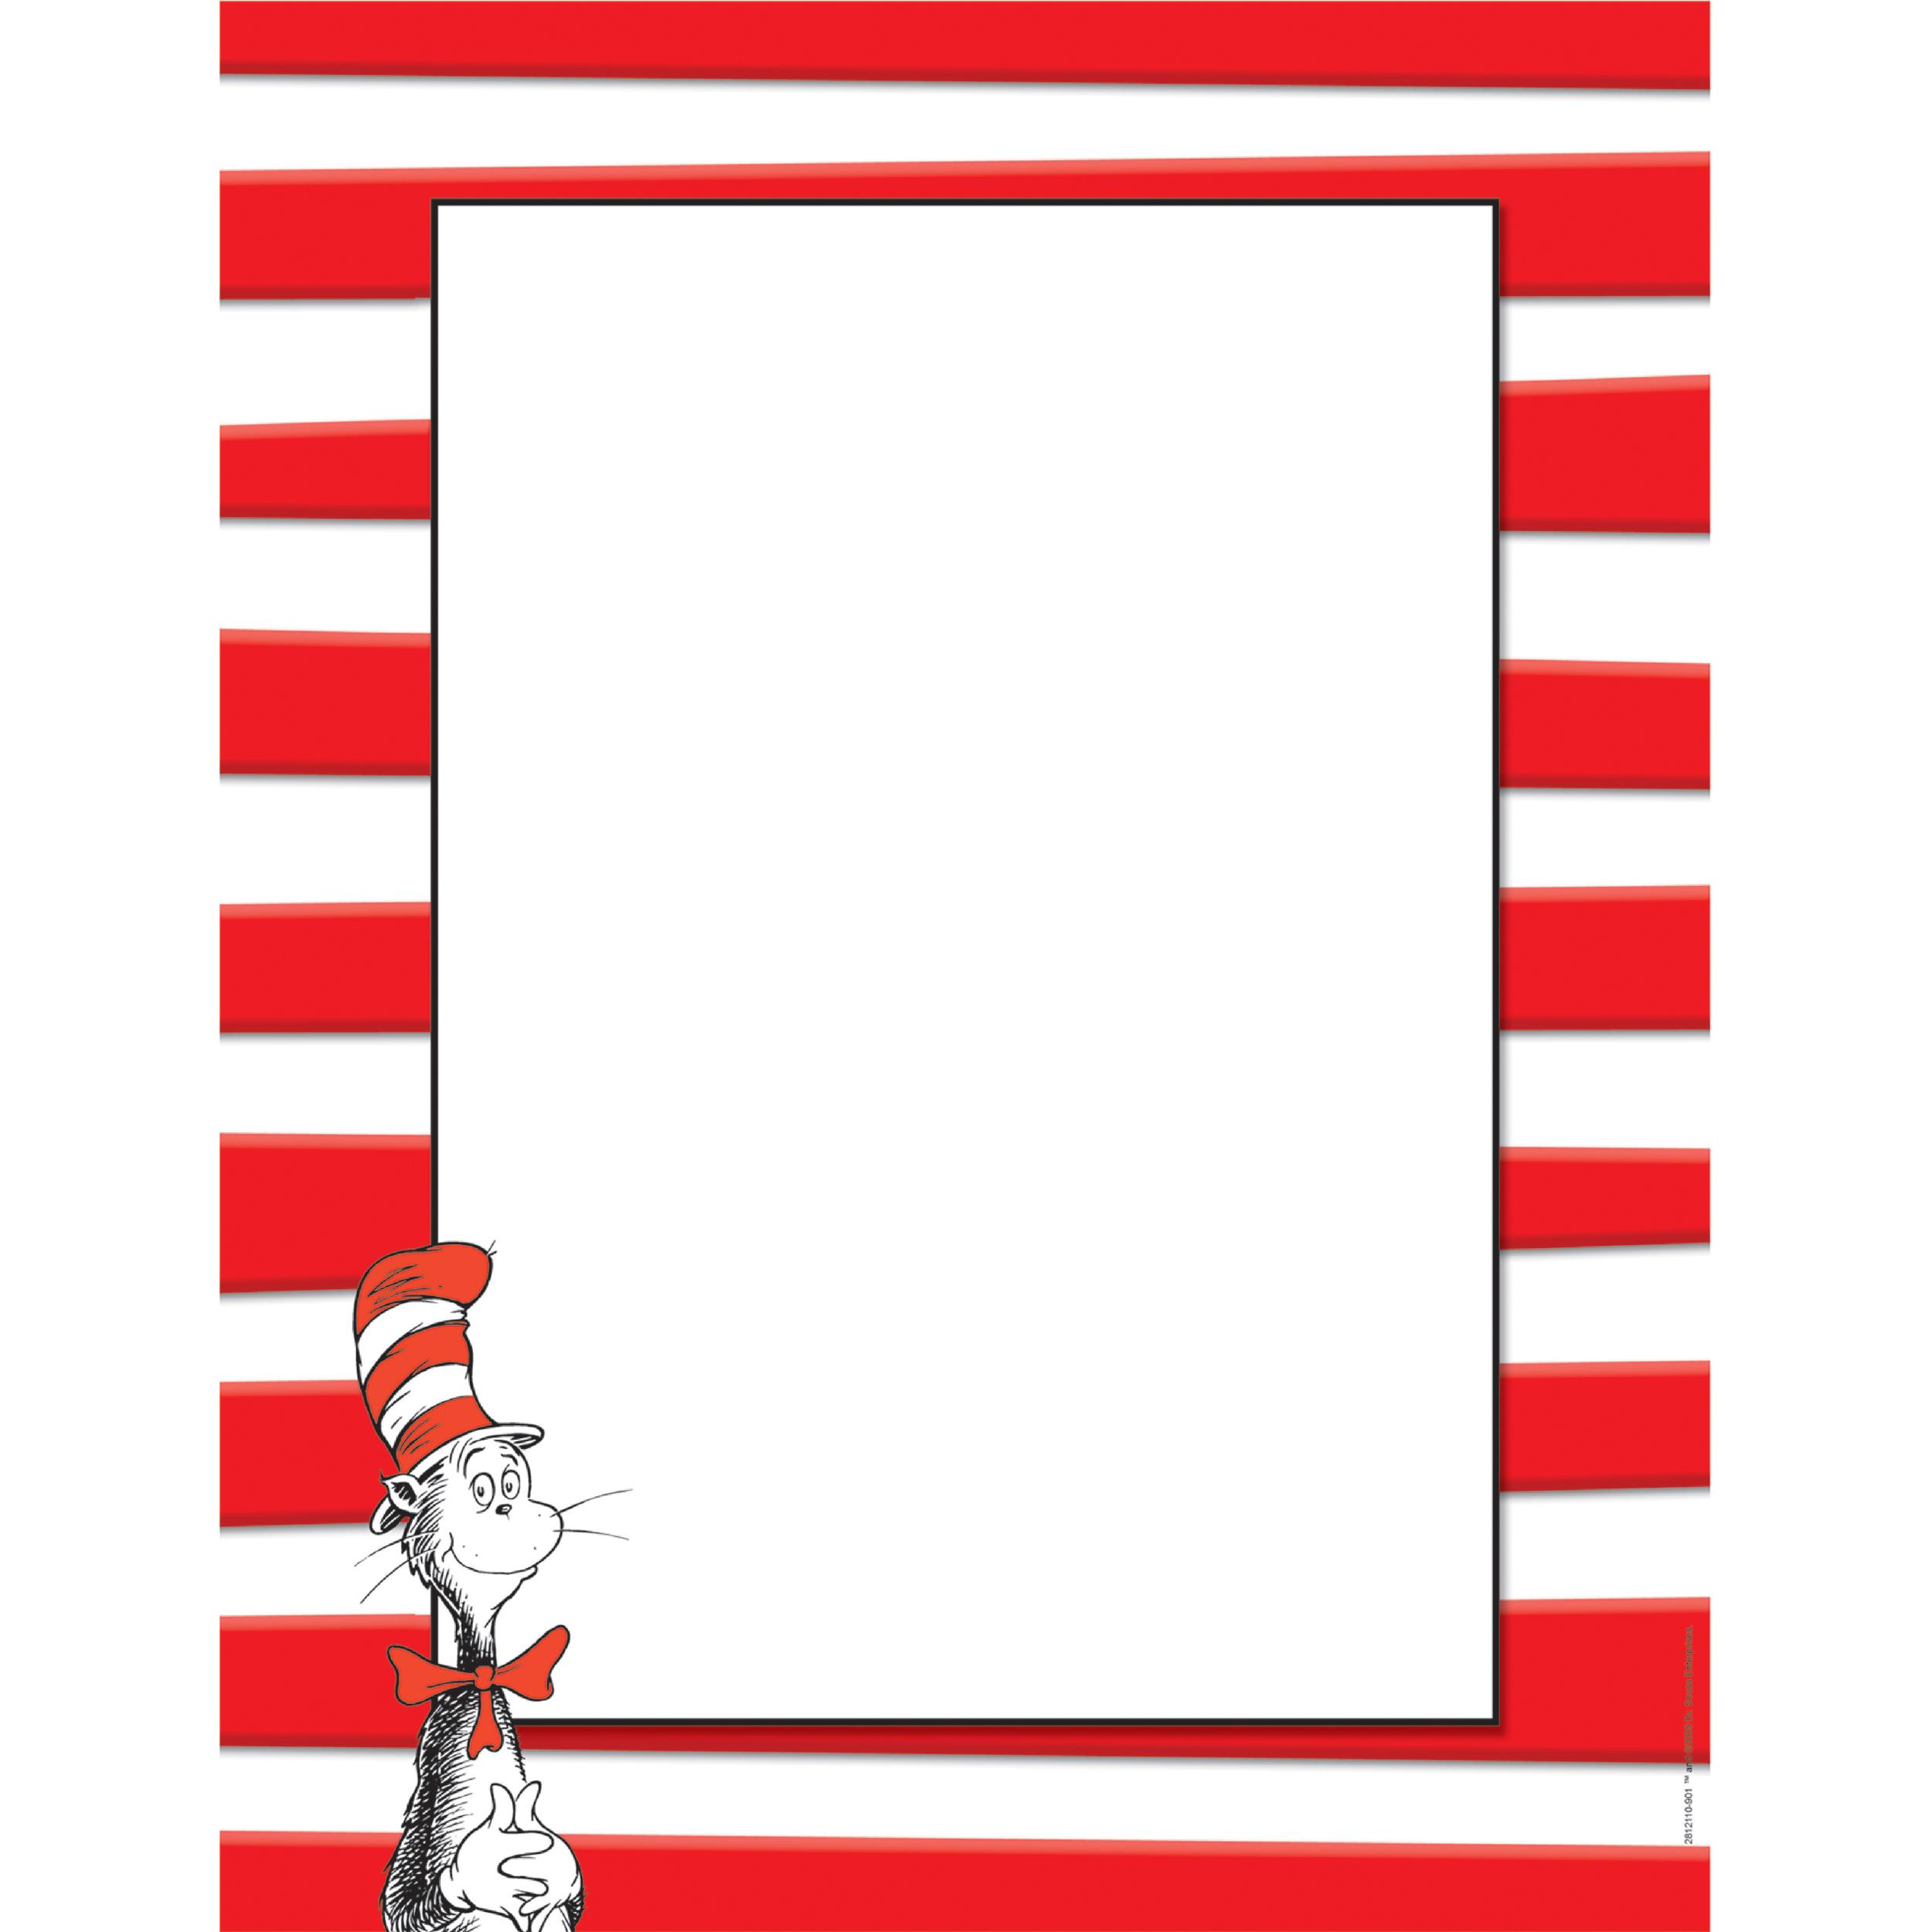 Dr Seuss Border Paper N2 free image.